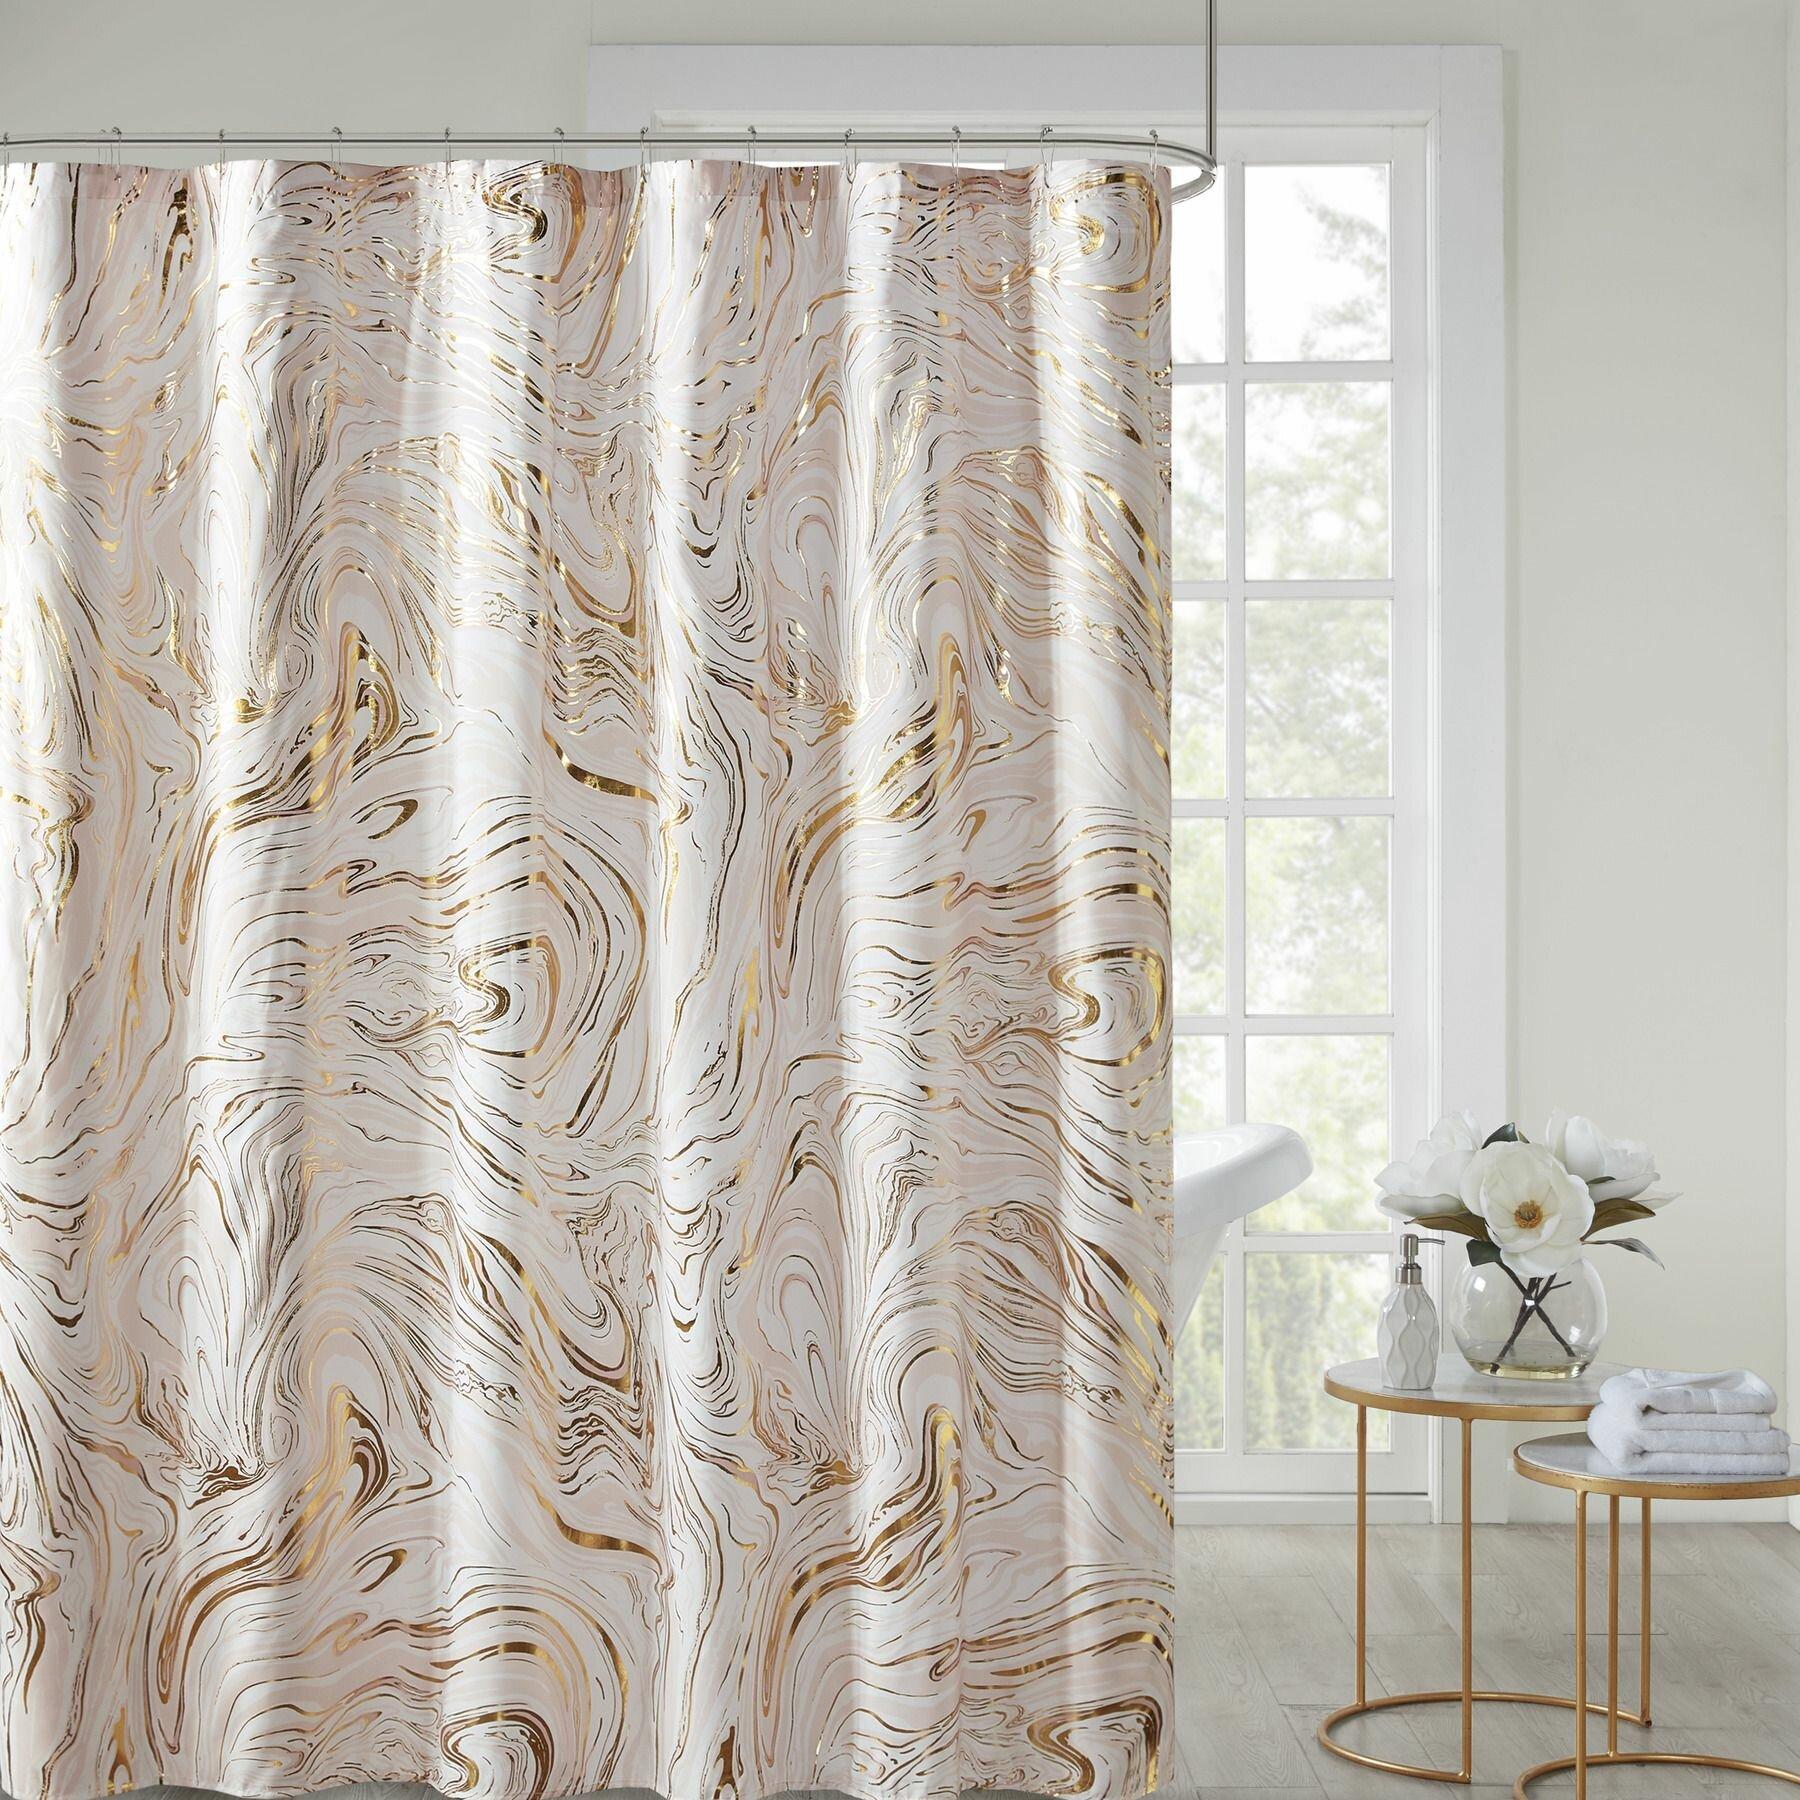 Mercer41 Ariya Abstract Single Shower Curtain Reviews Wayfair